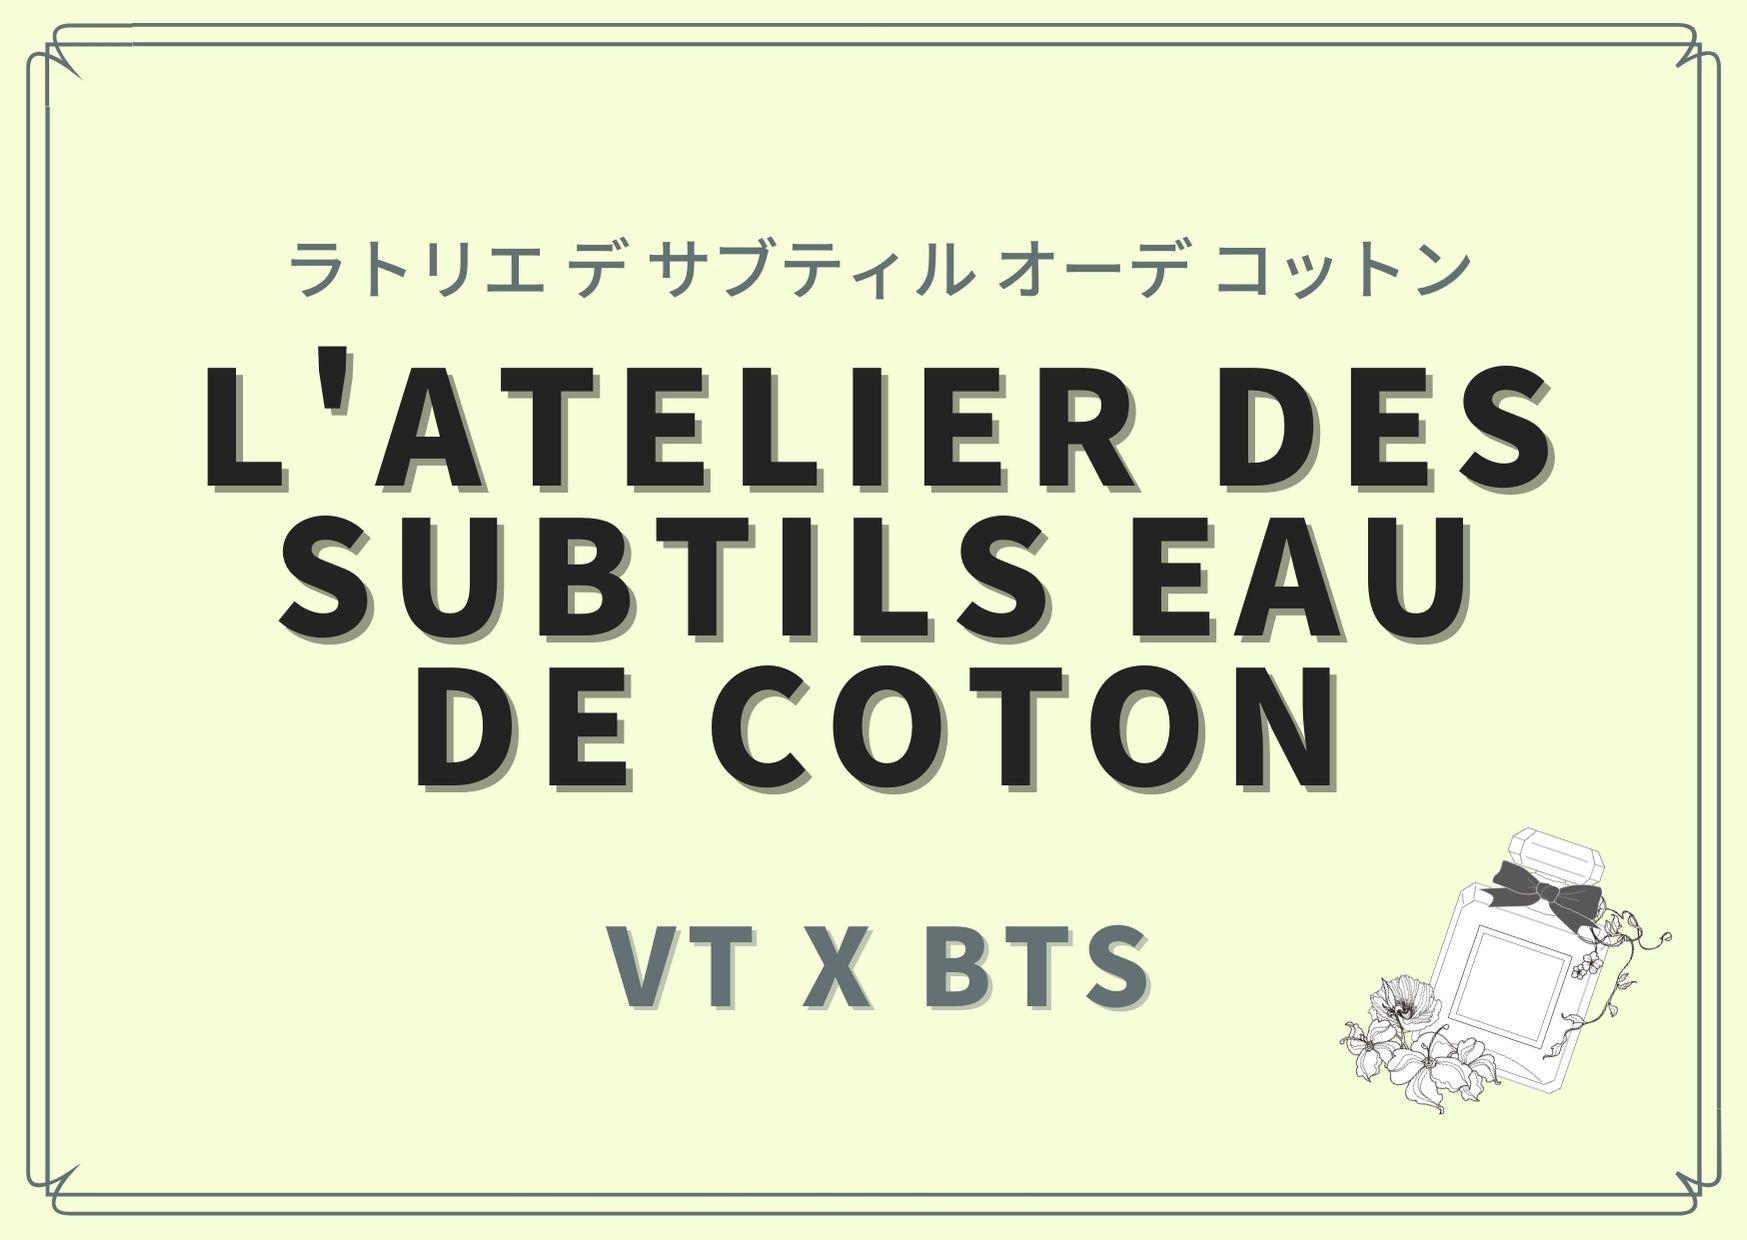 L'Atelier des Subtils Eau de Coton(ラトリエ デ サブティル オーデ コットン)/VTxBTS(ブイティxビーティーエス)